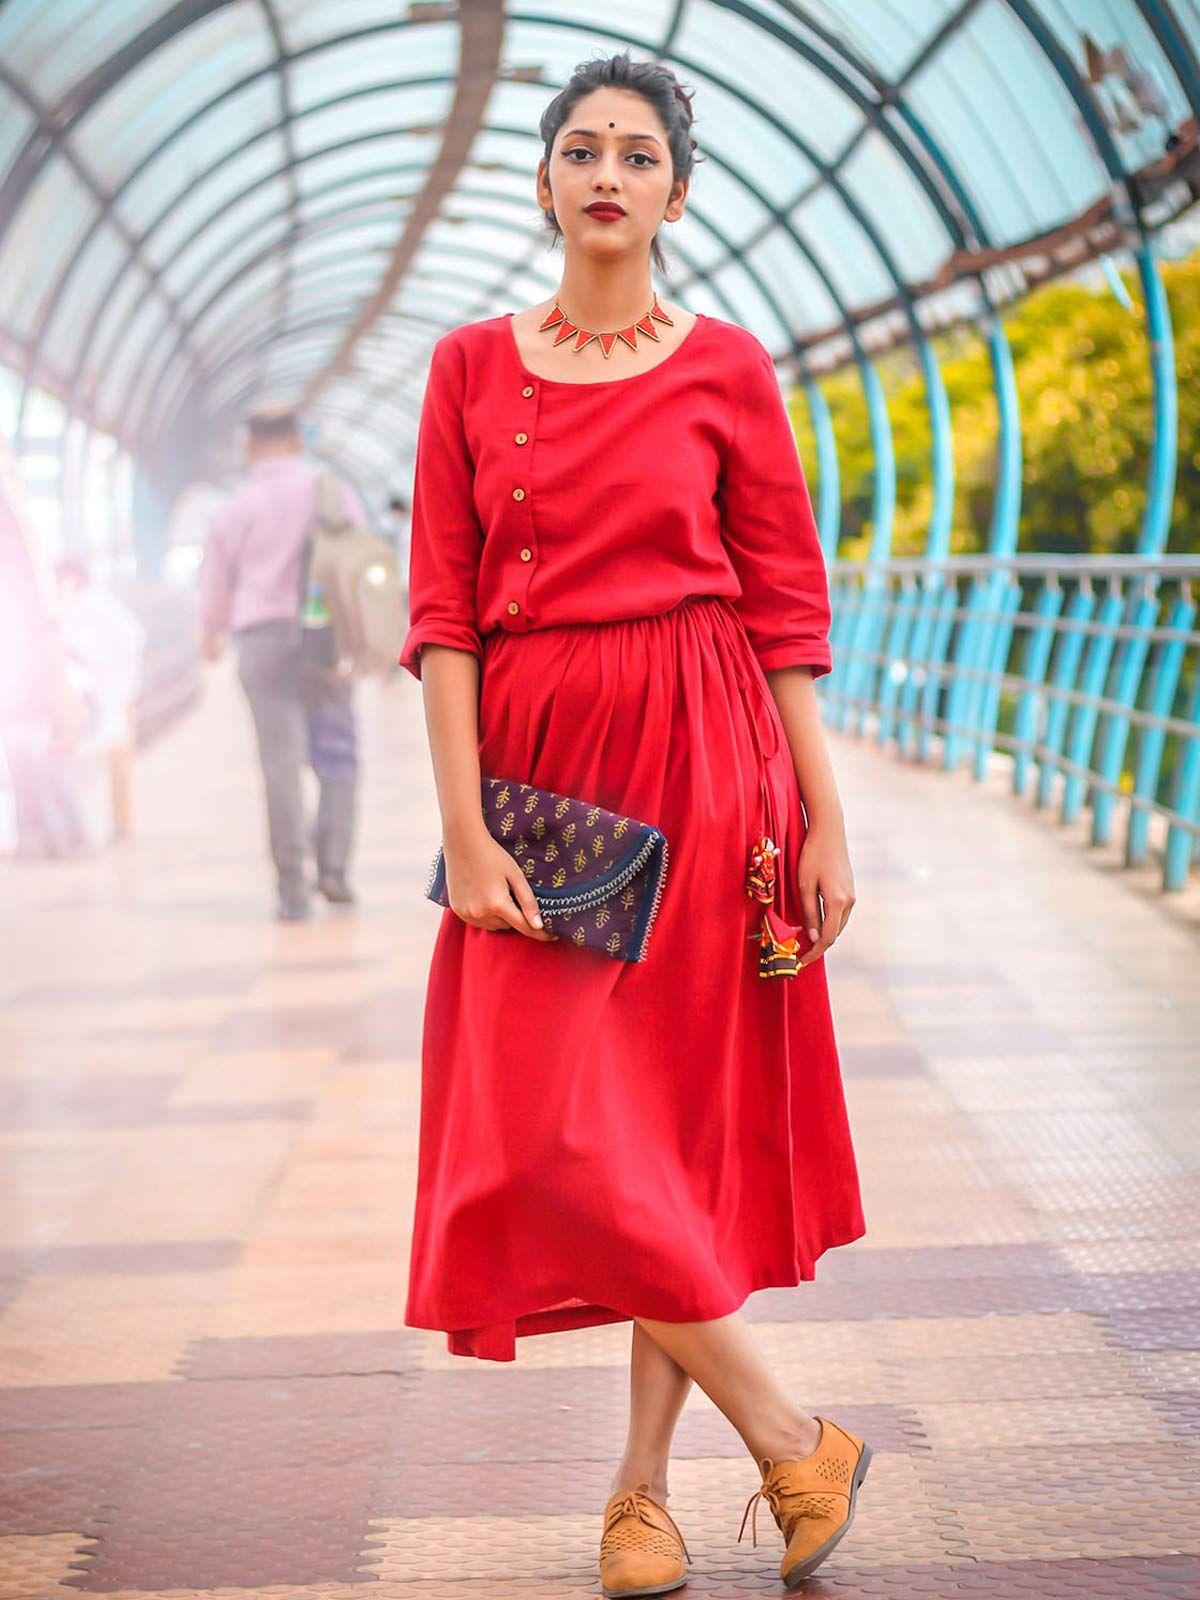 Red Cotton Vintage Dress